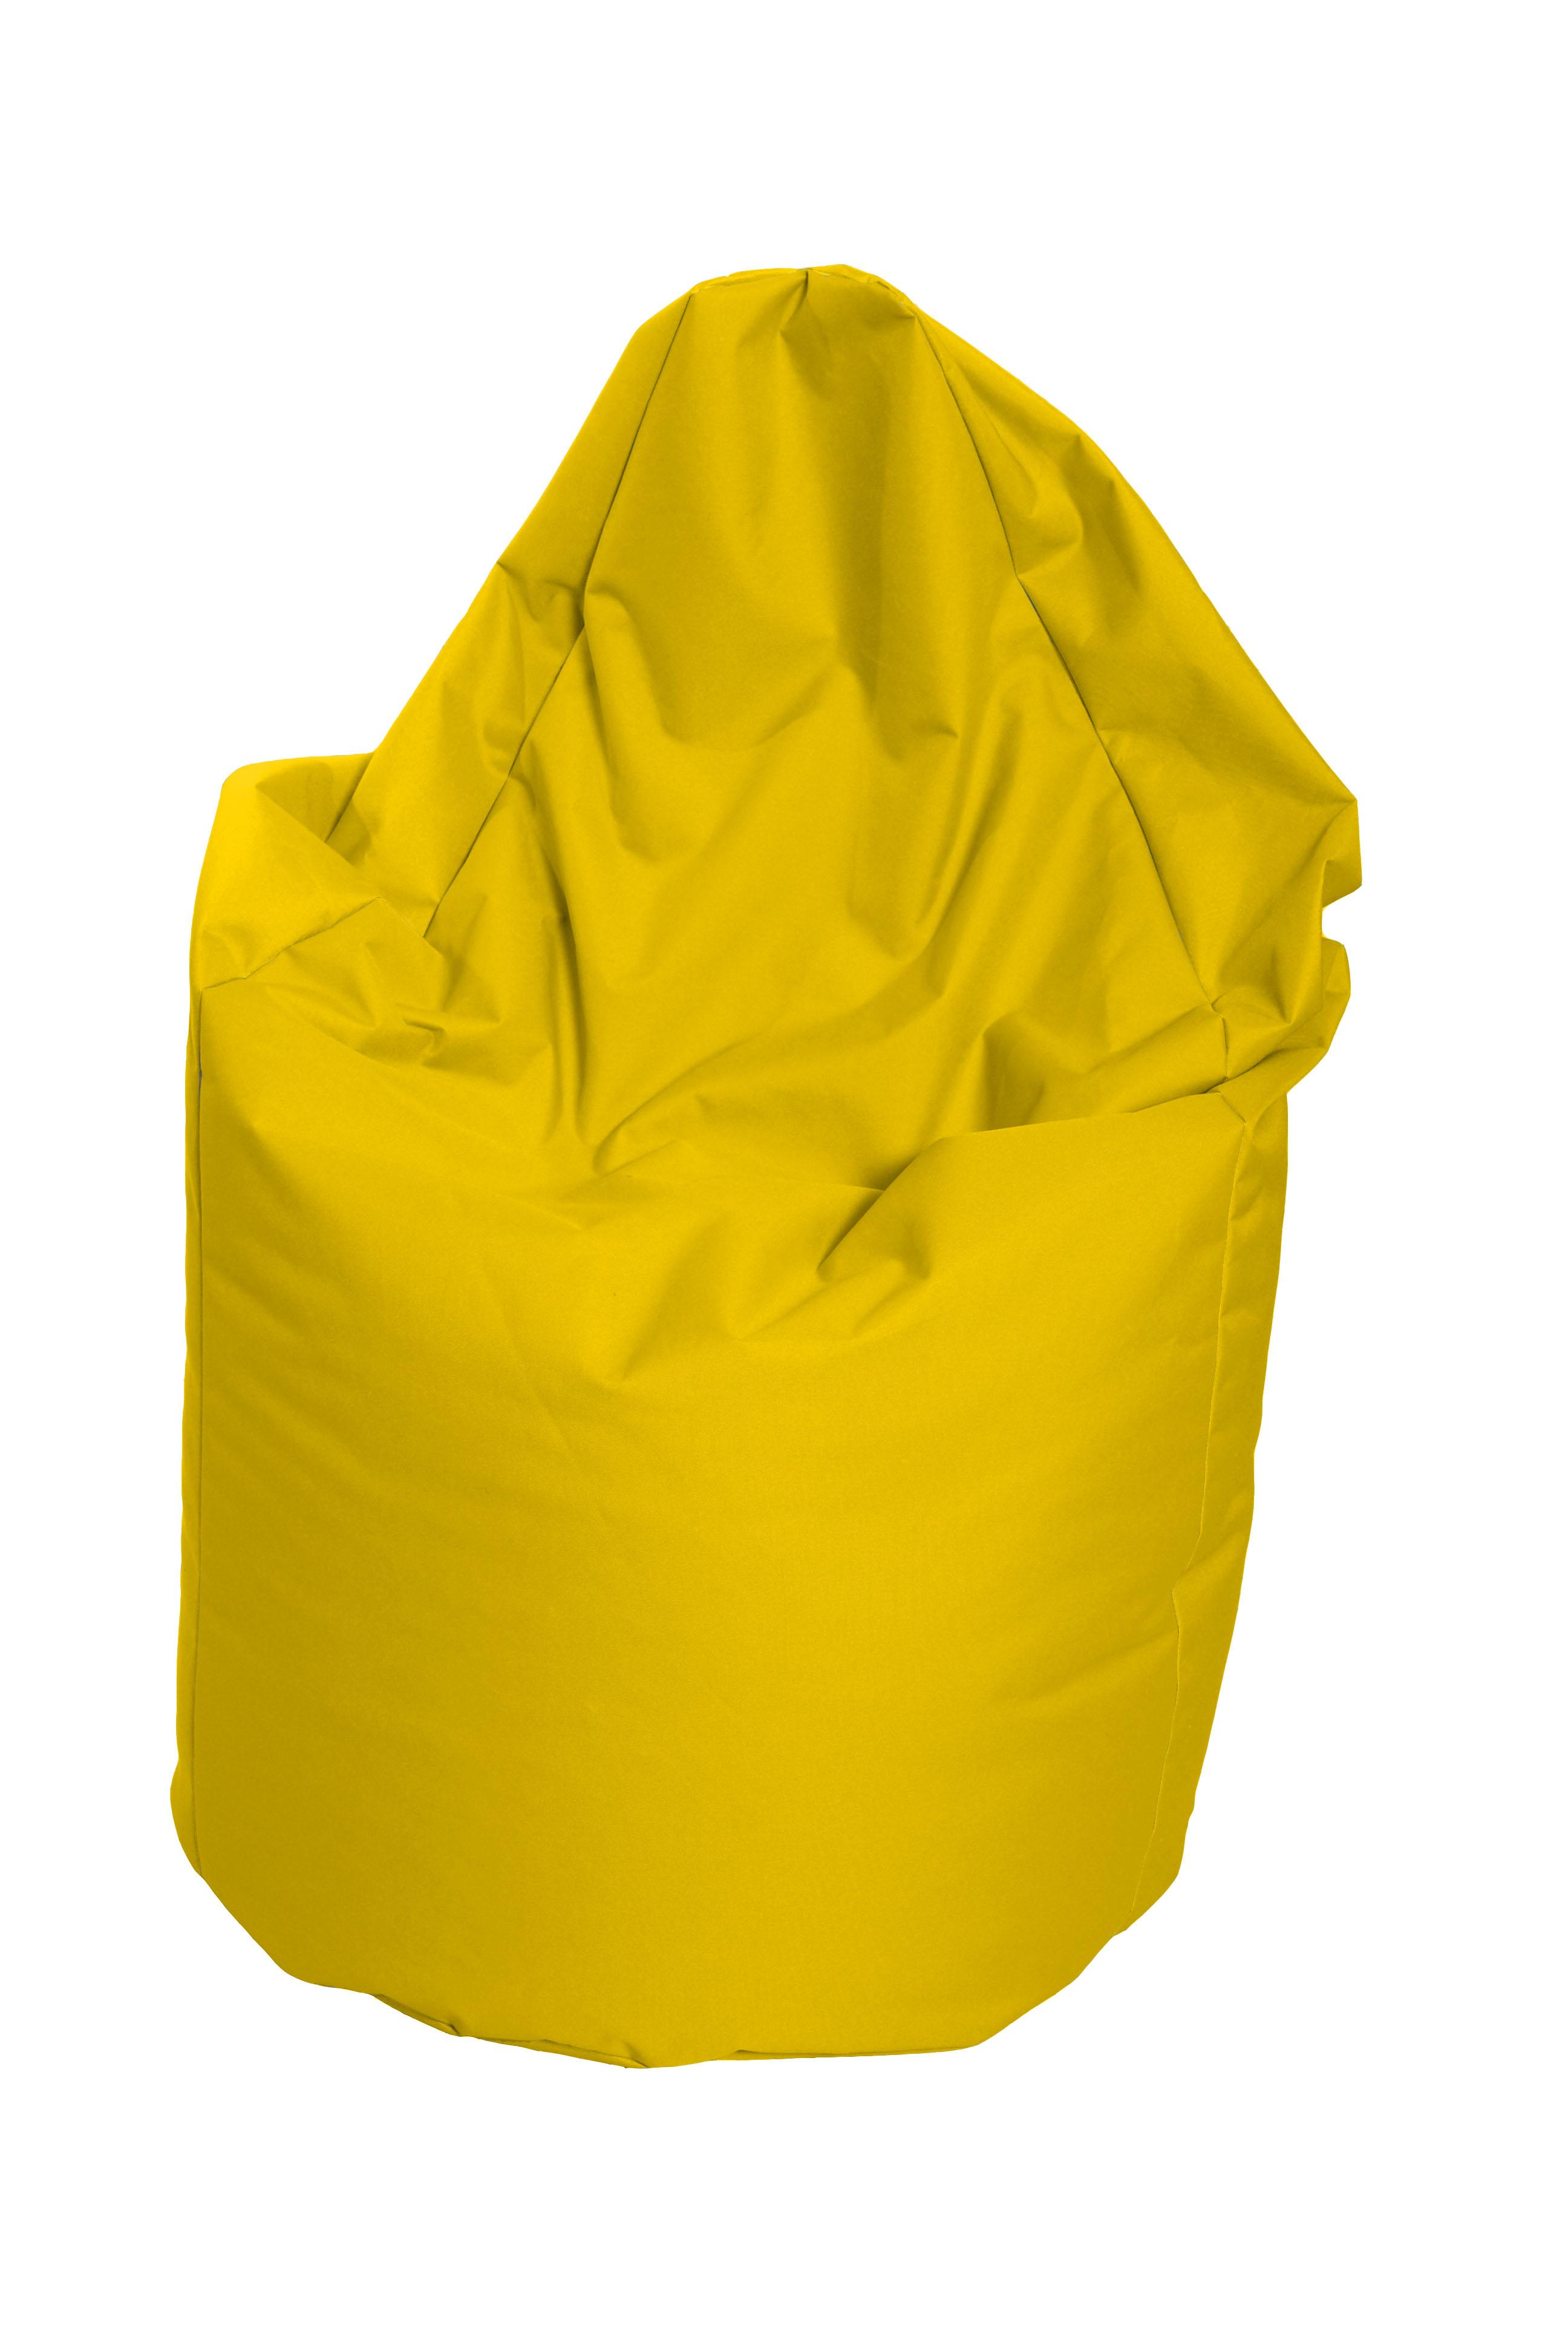 M&M sedací vak hruška Mega s vnitřním obalem 140x80cm žlutá (žlutá 60103)